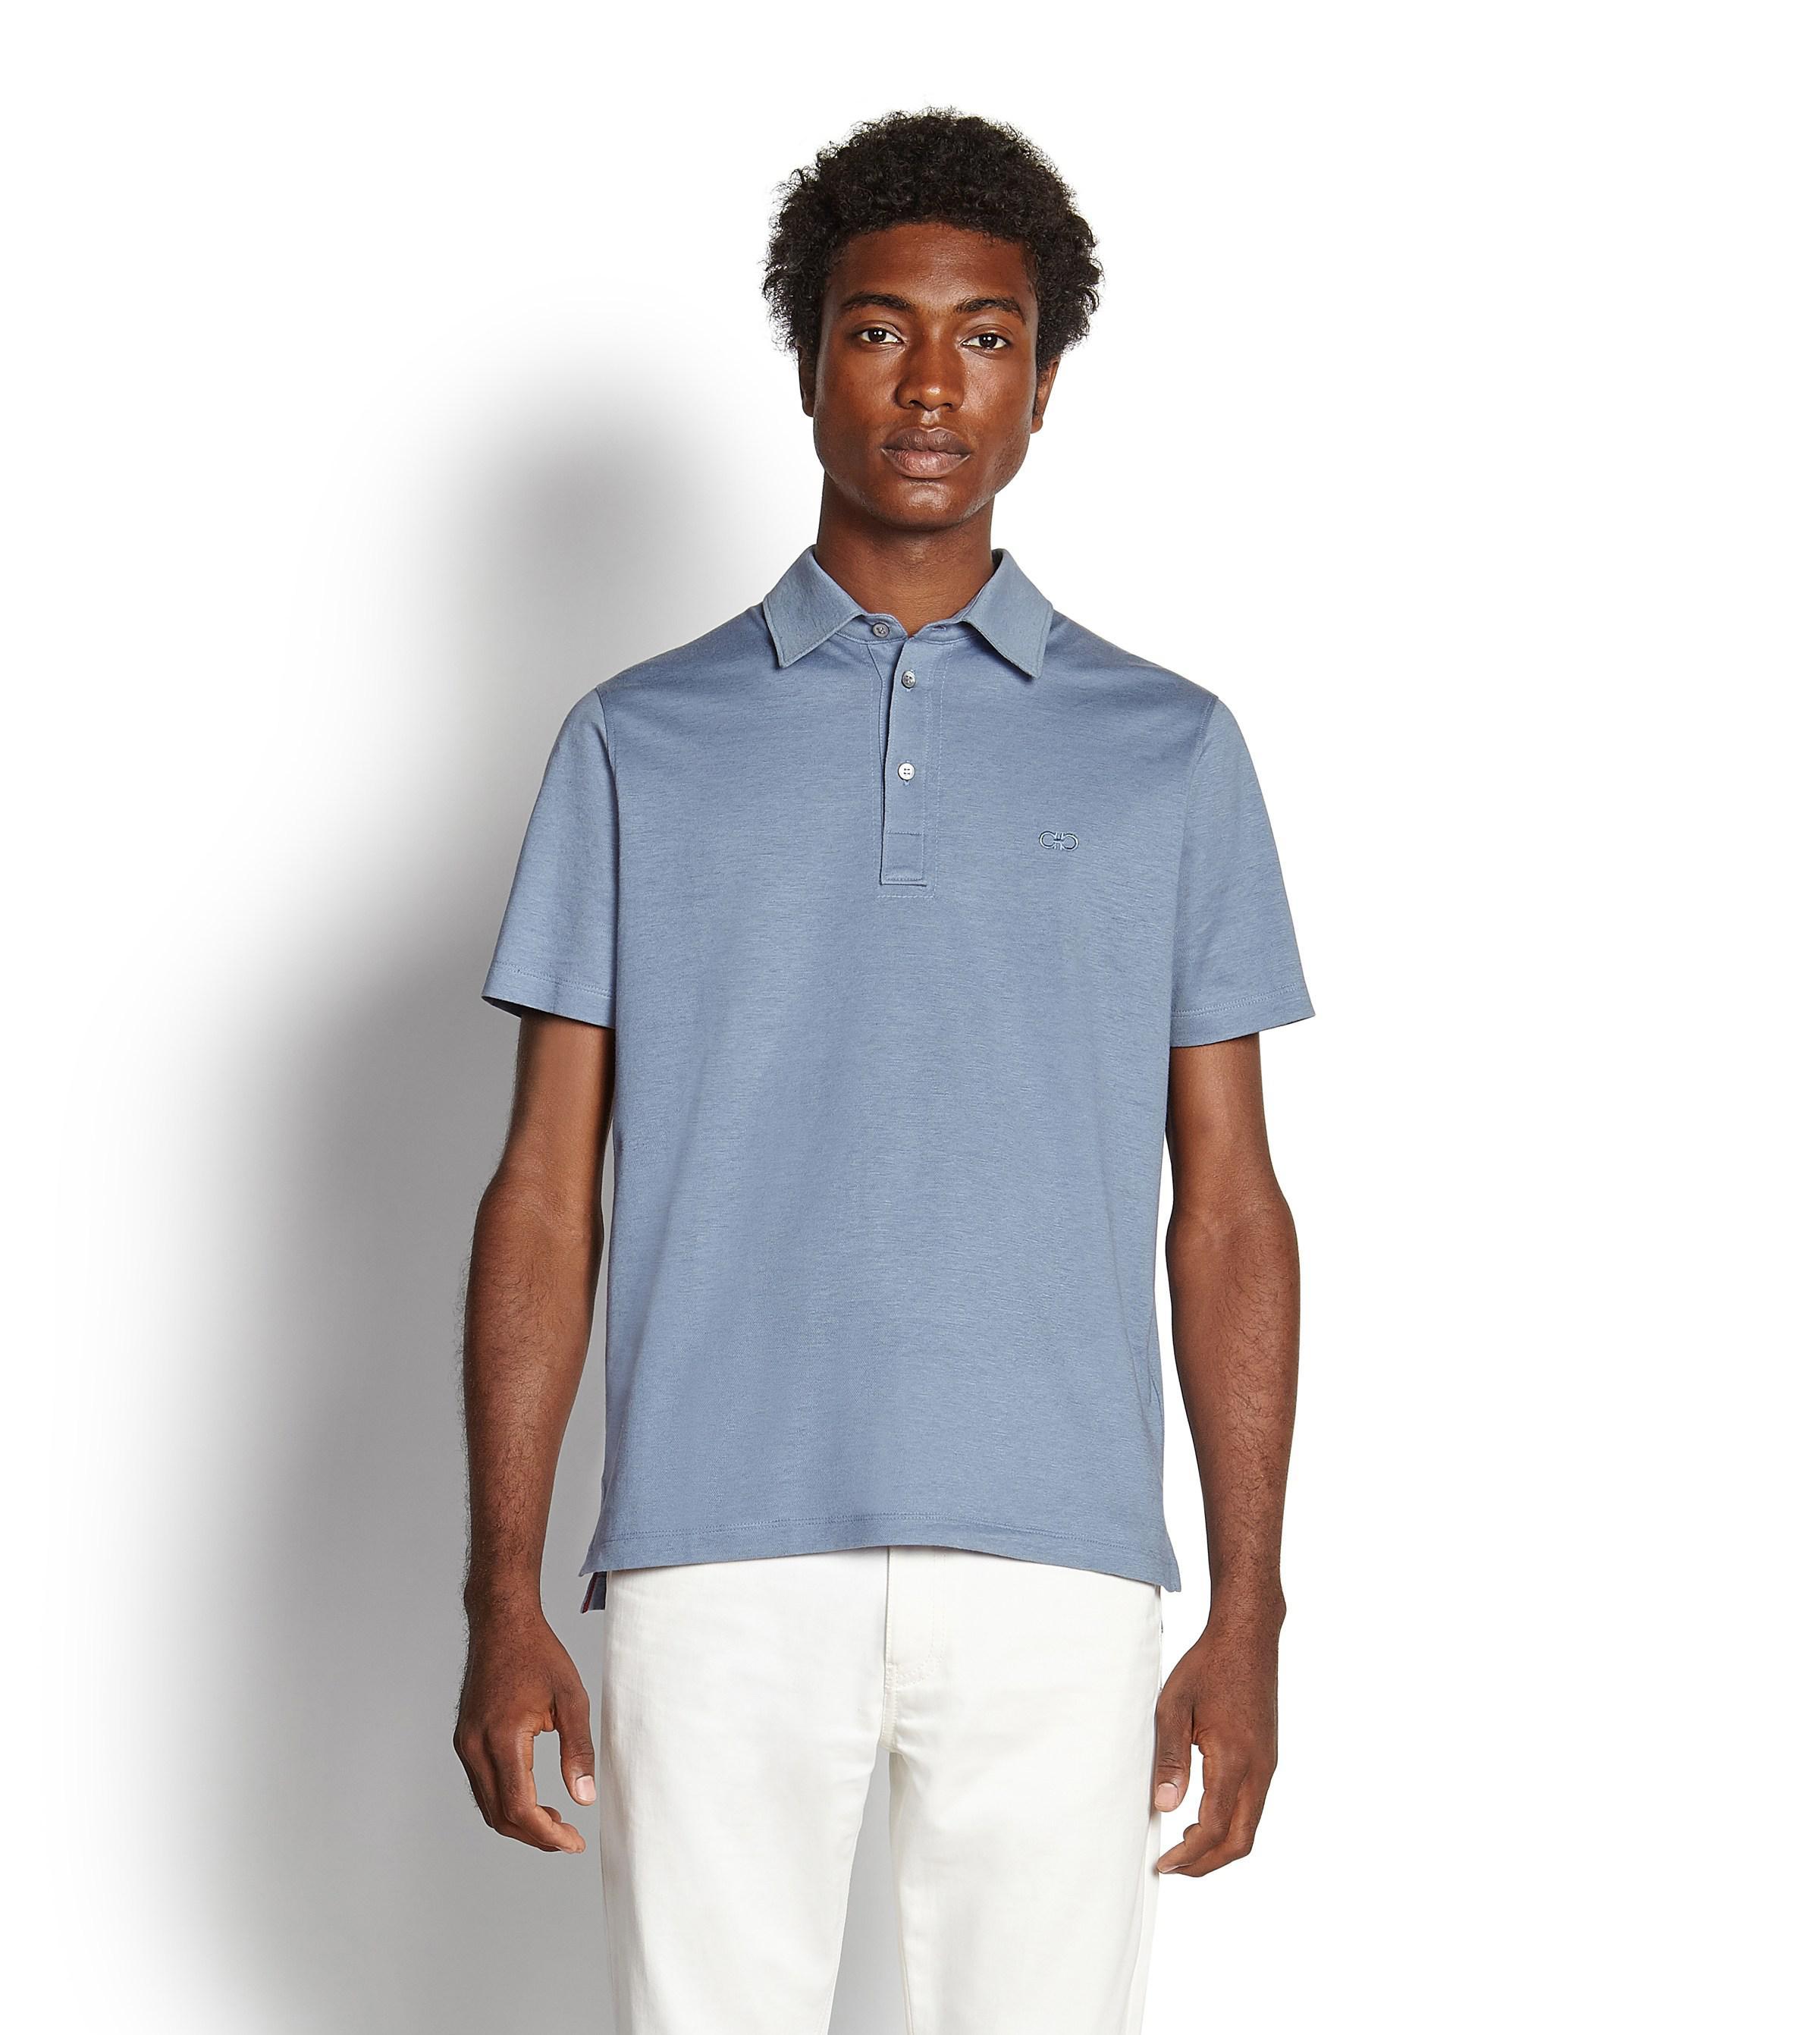 Lyst Ferragamo Cotton And Linen Polo Shirt In Blue For Men